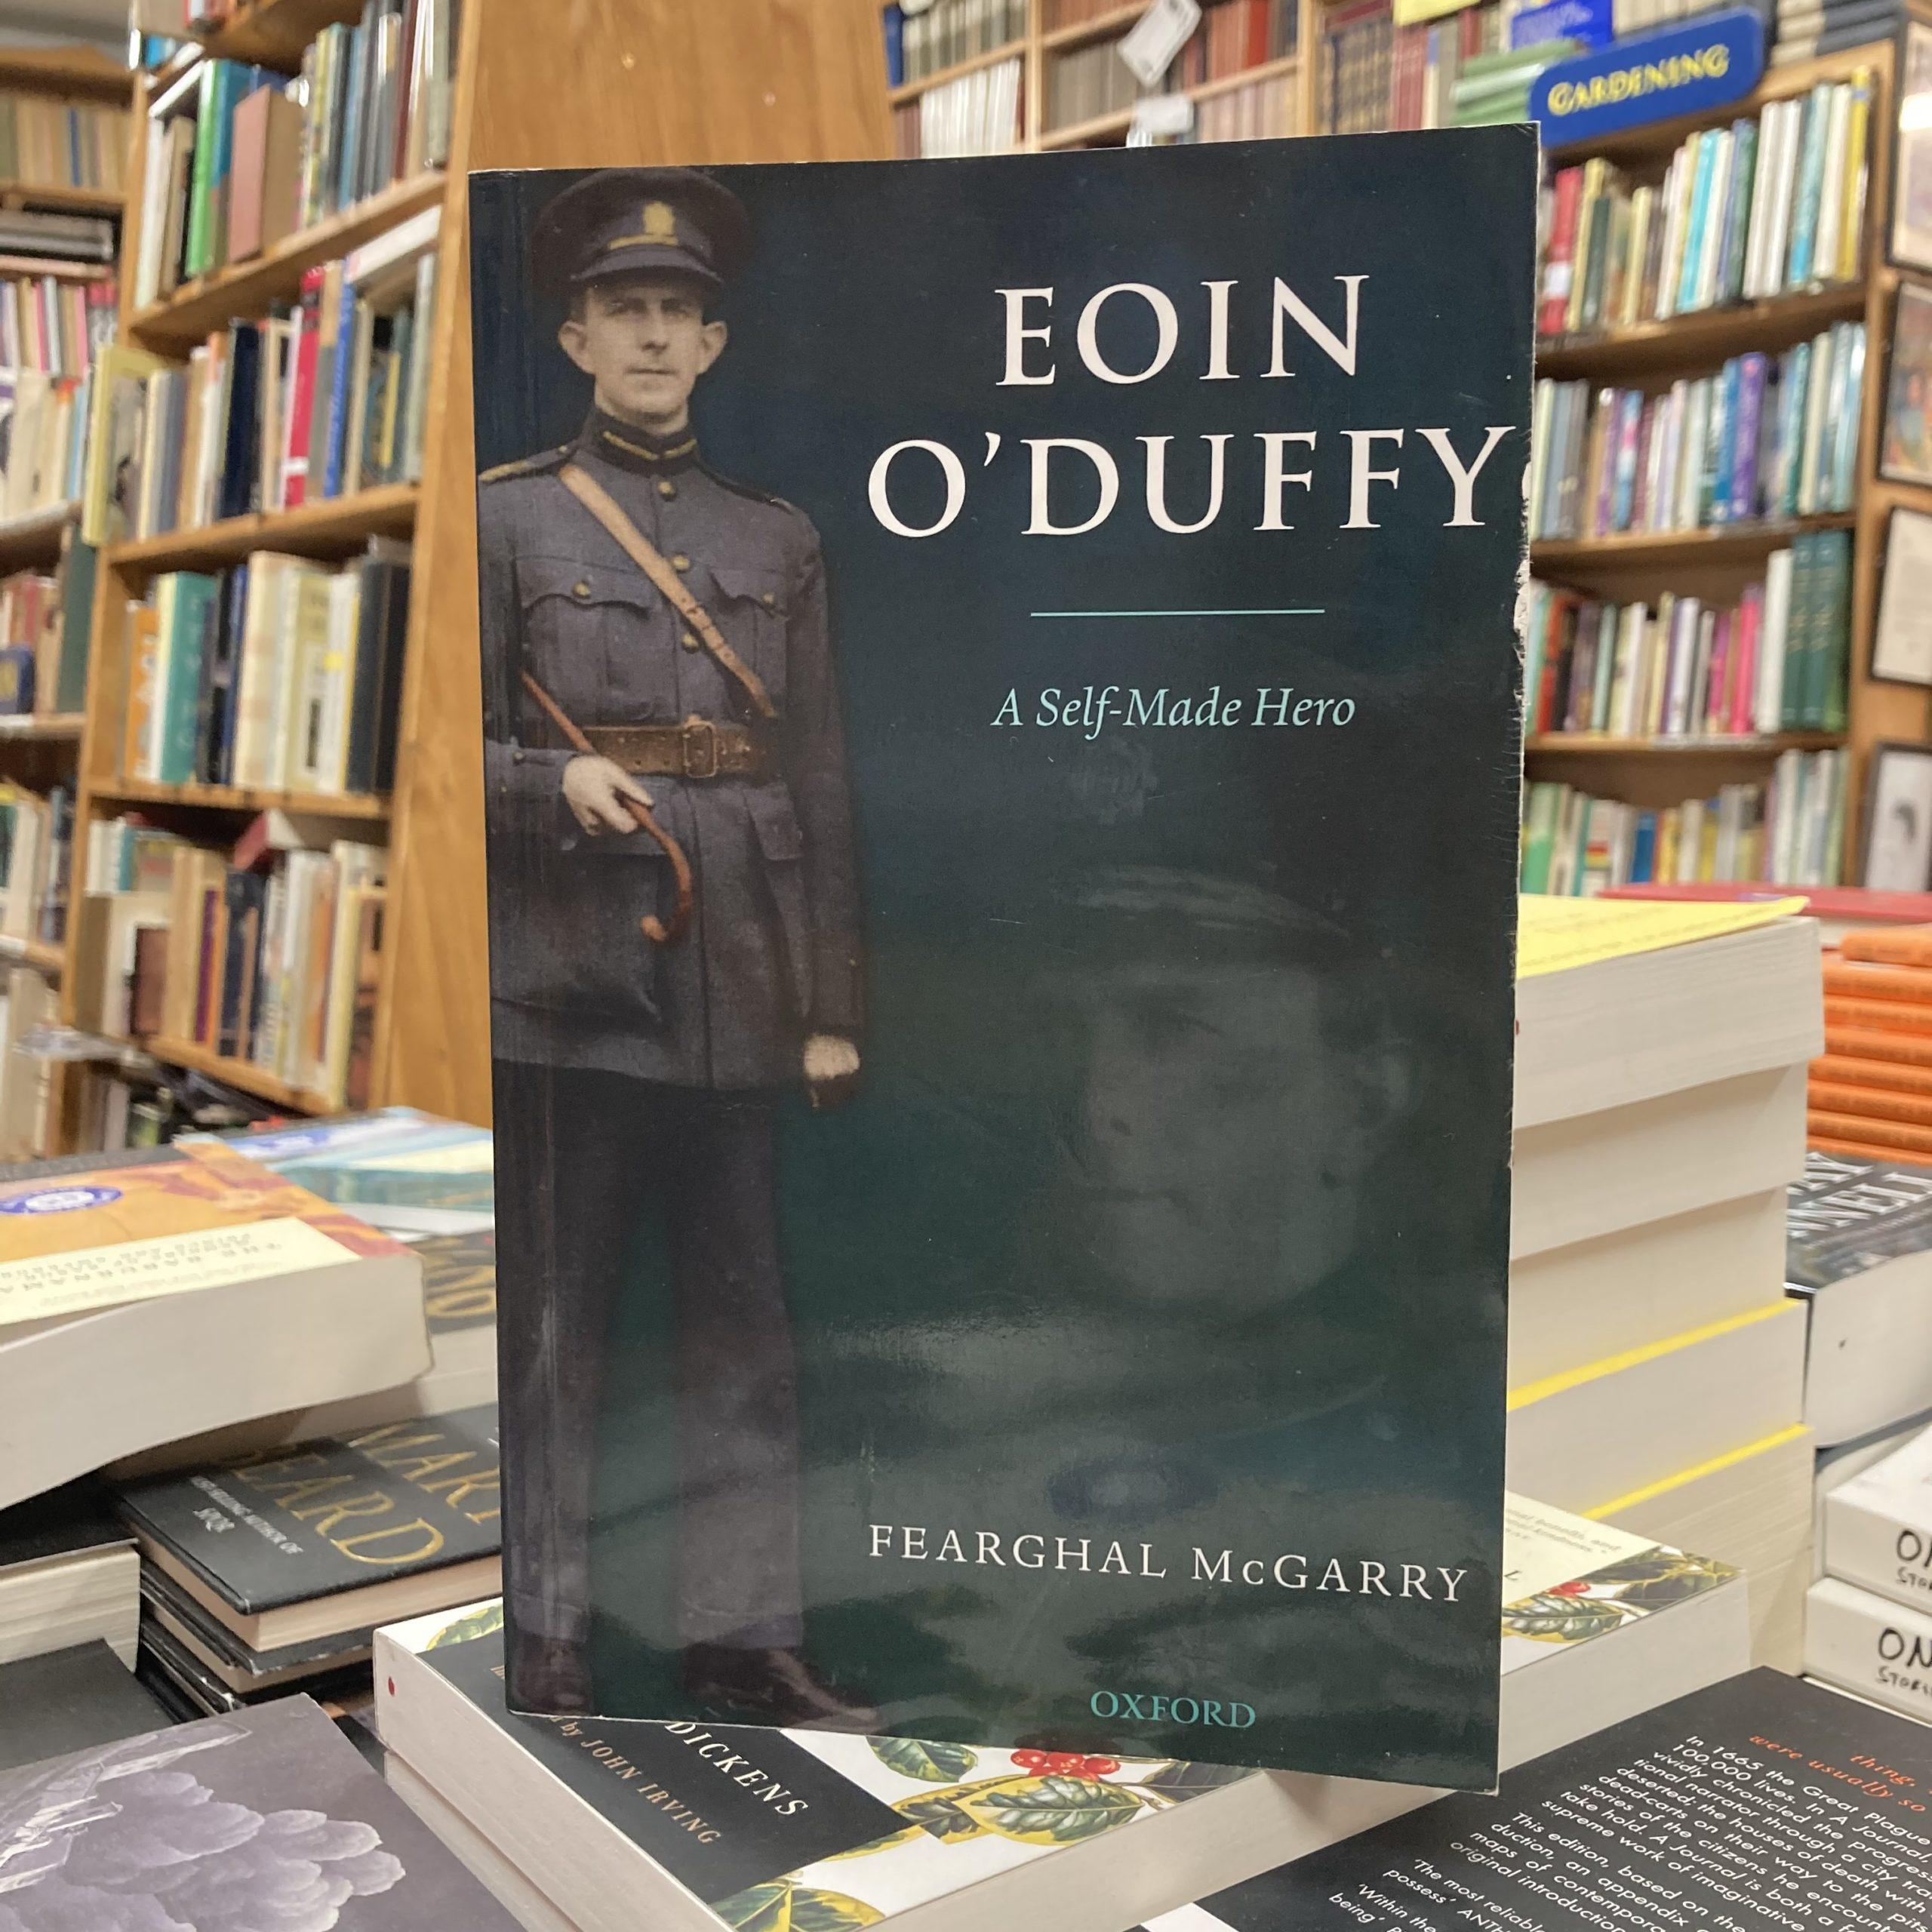 Eoin O'Duffy – A Self-Made Hero | Fearghal McGarry | Charlie Byrne's